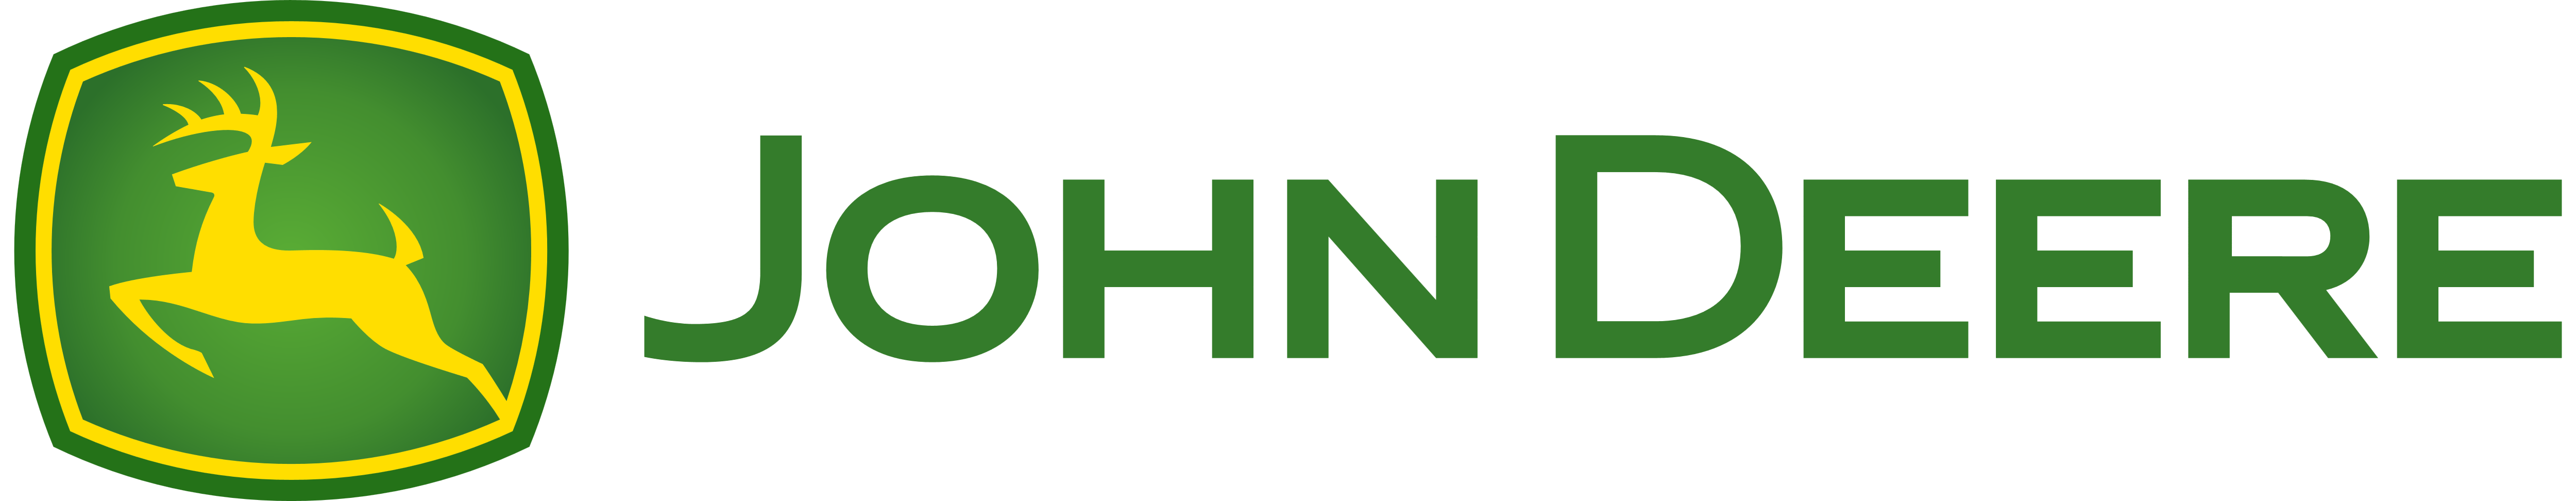 Home Design Game Ideas John Deere Logos Download